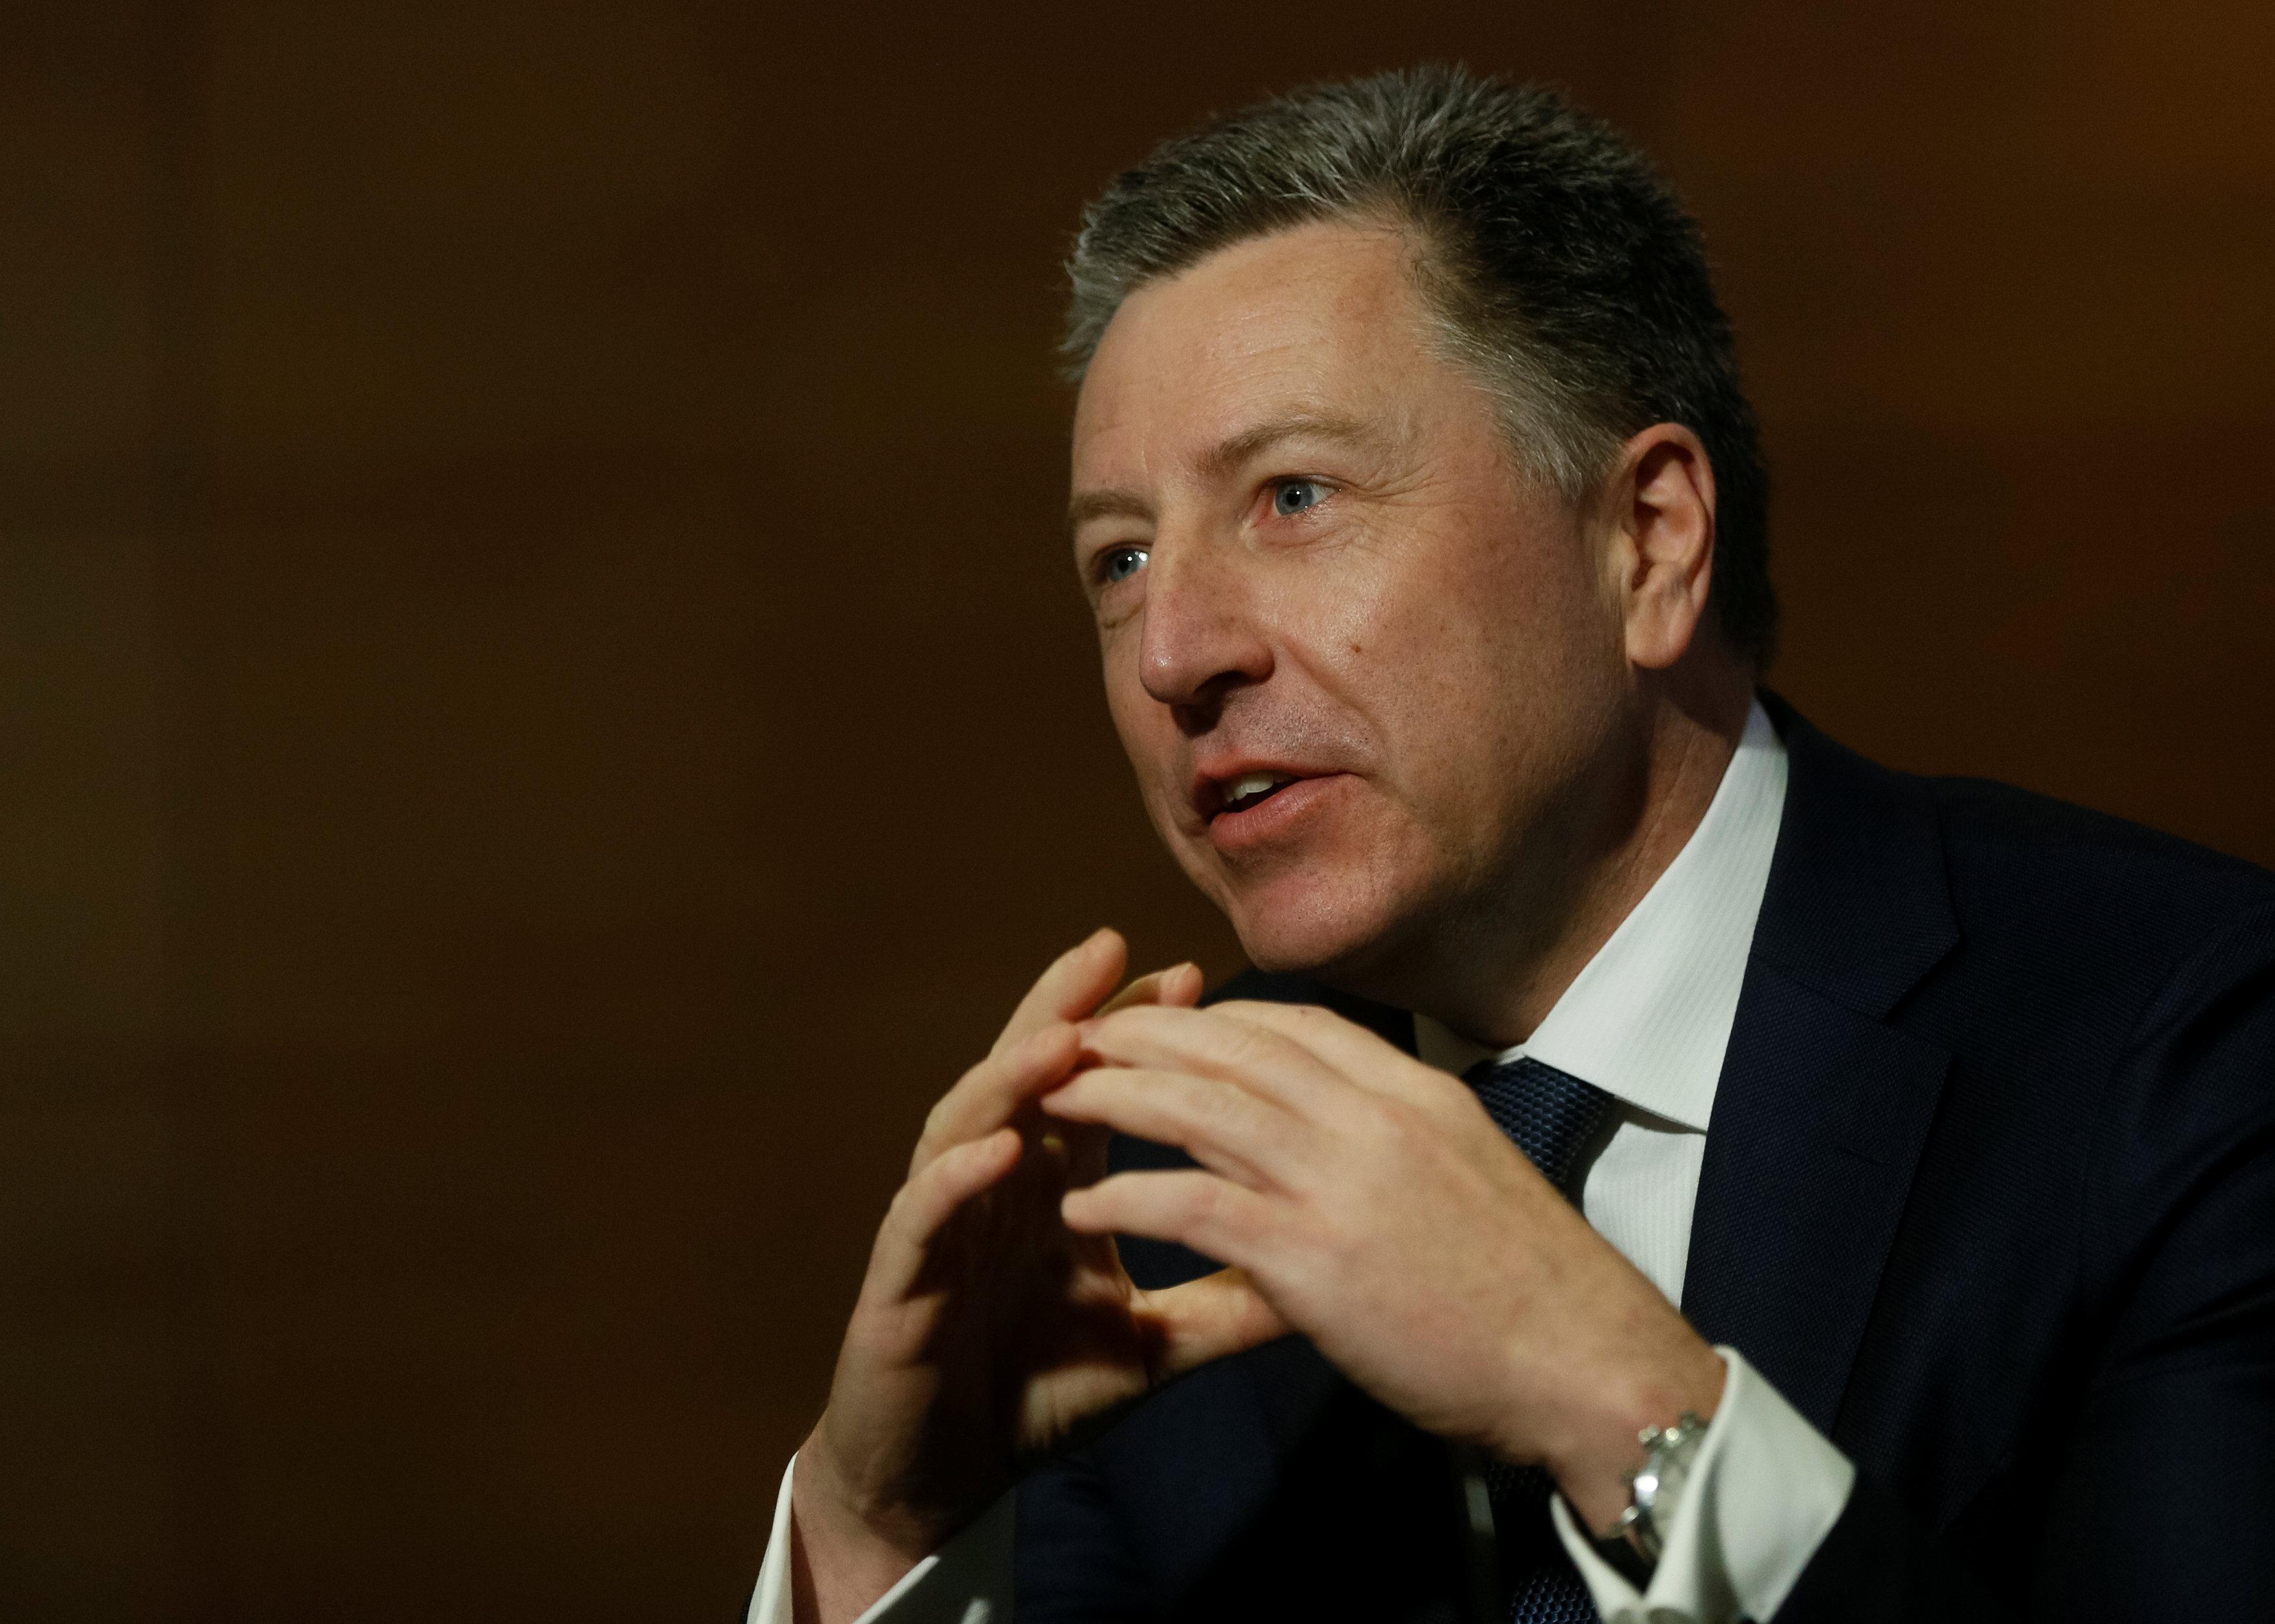 Kurt Volker, United States Special Representative for Ukraine Negotiations, speaks during an interview with Reuters in Kiev, Ukraine October 28, 2017. REUTERS/Valentyn Ogirenko